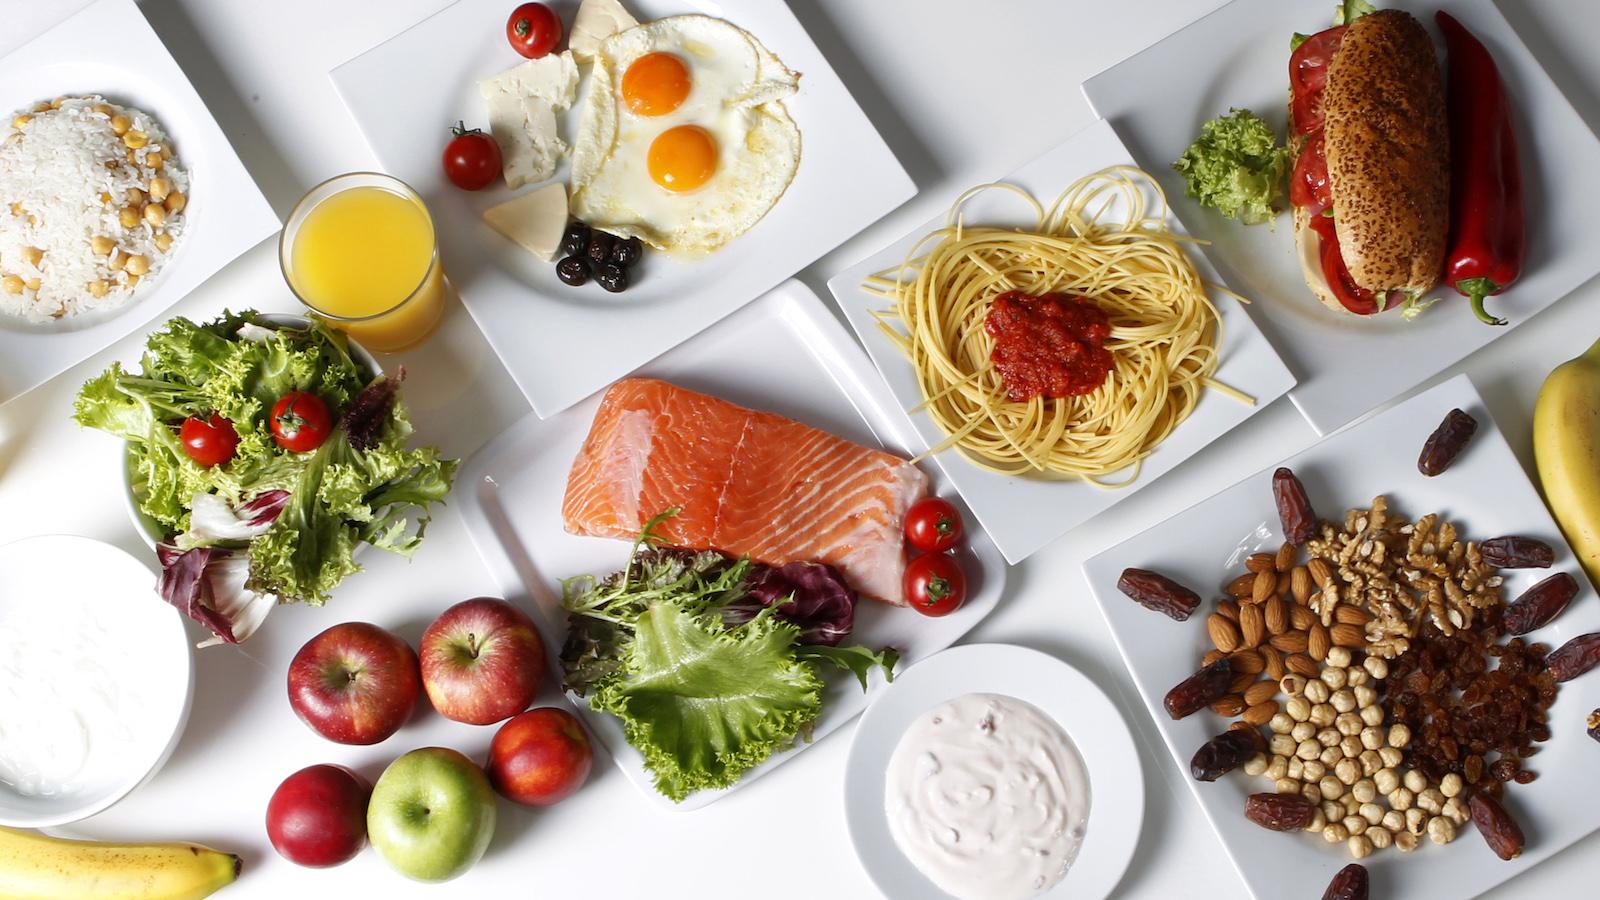 healthy-medeteranian-diet.jpg?quality=80